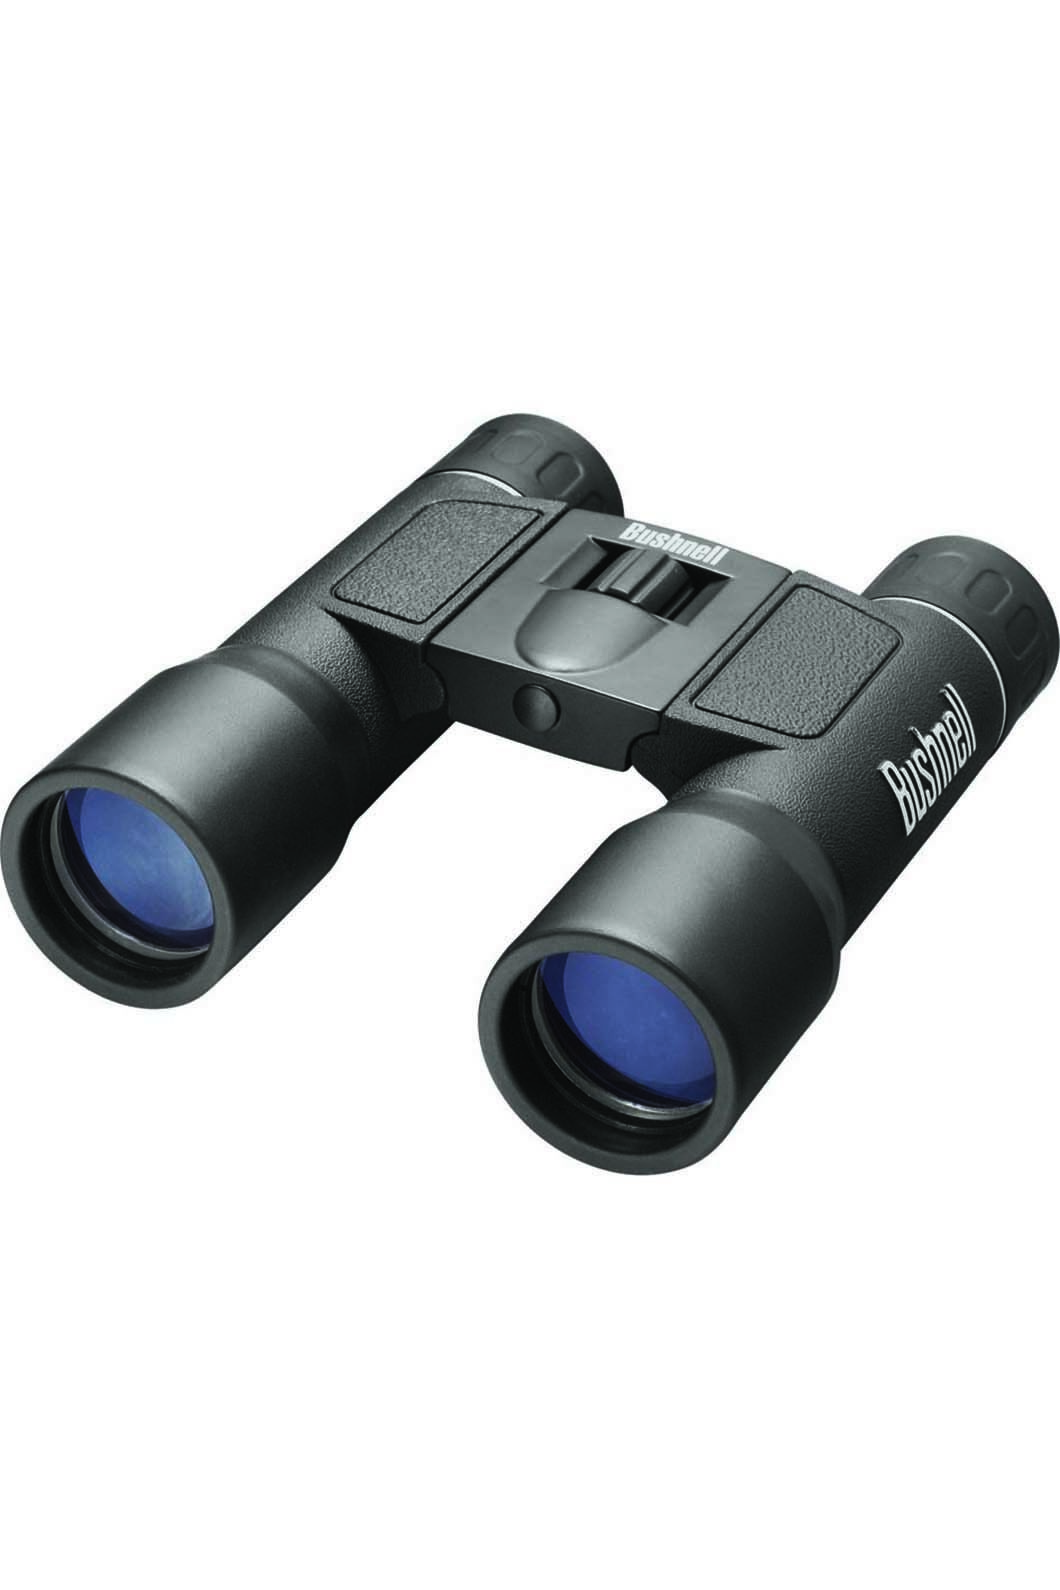 Bushnell 16 x 32 Powerview Binoculars, None, hi-res